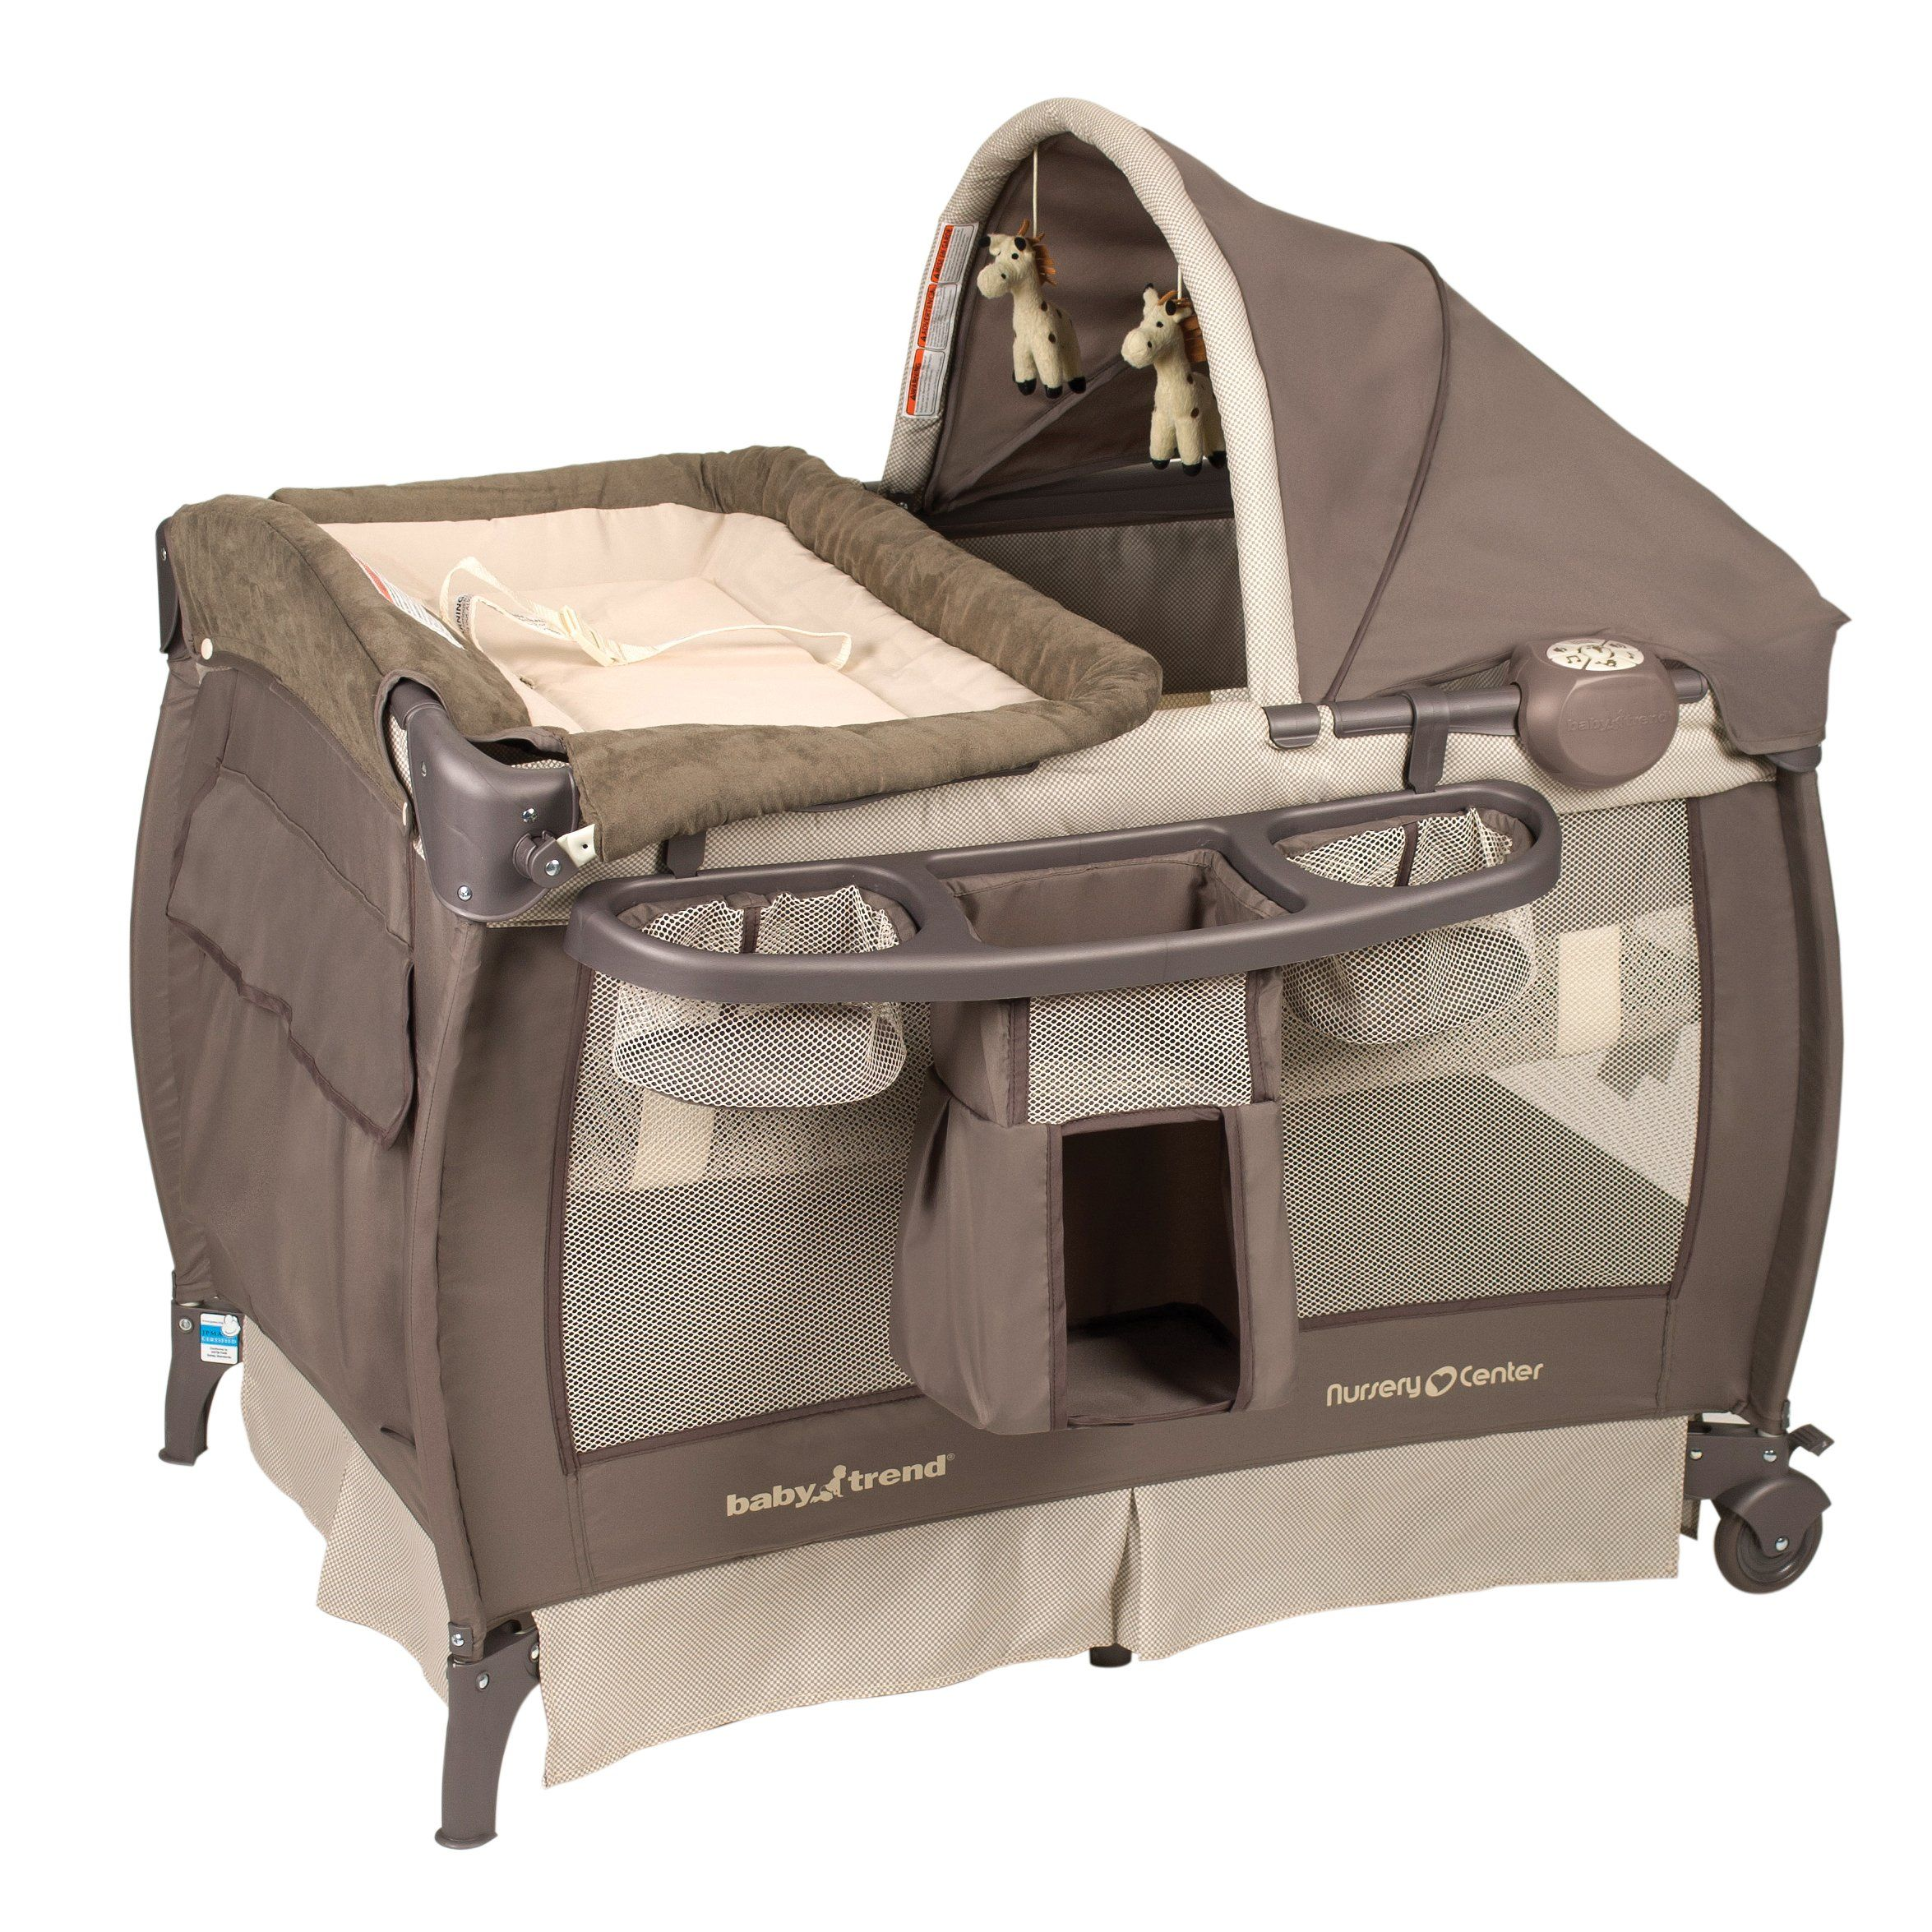 Amazon.com : Baby Trend Deluxe Nursery Center, Hudson ...